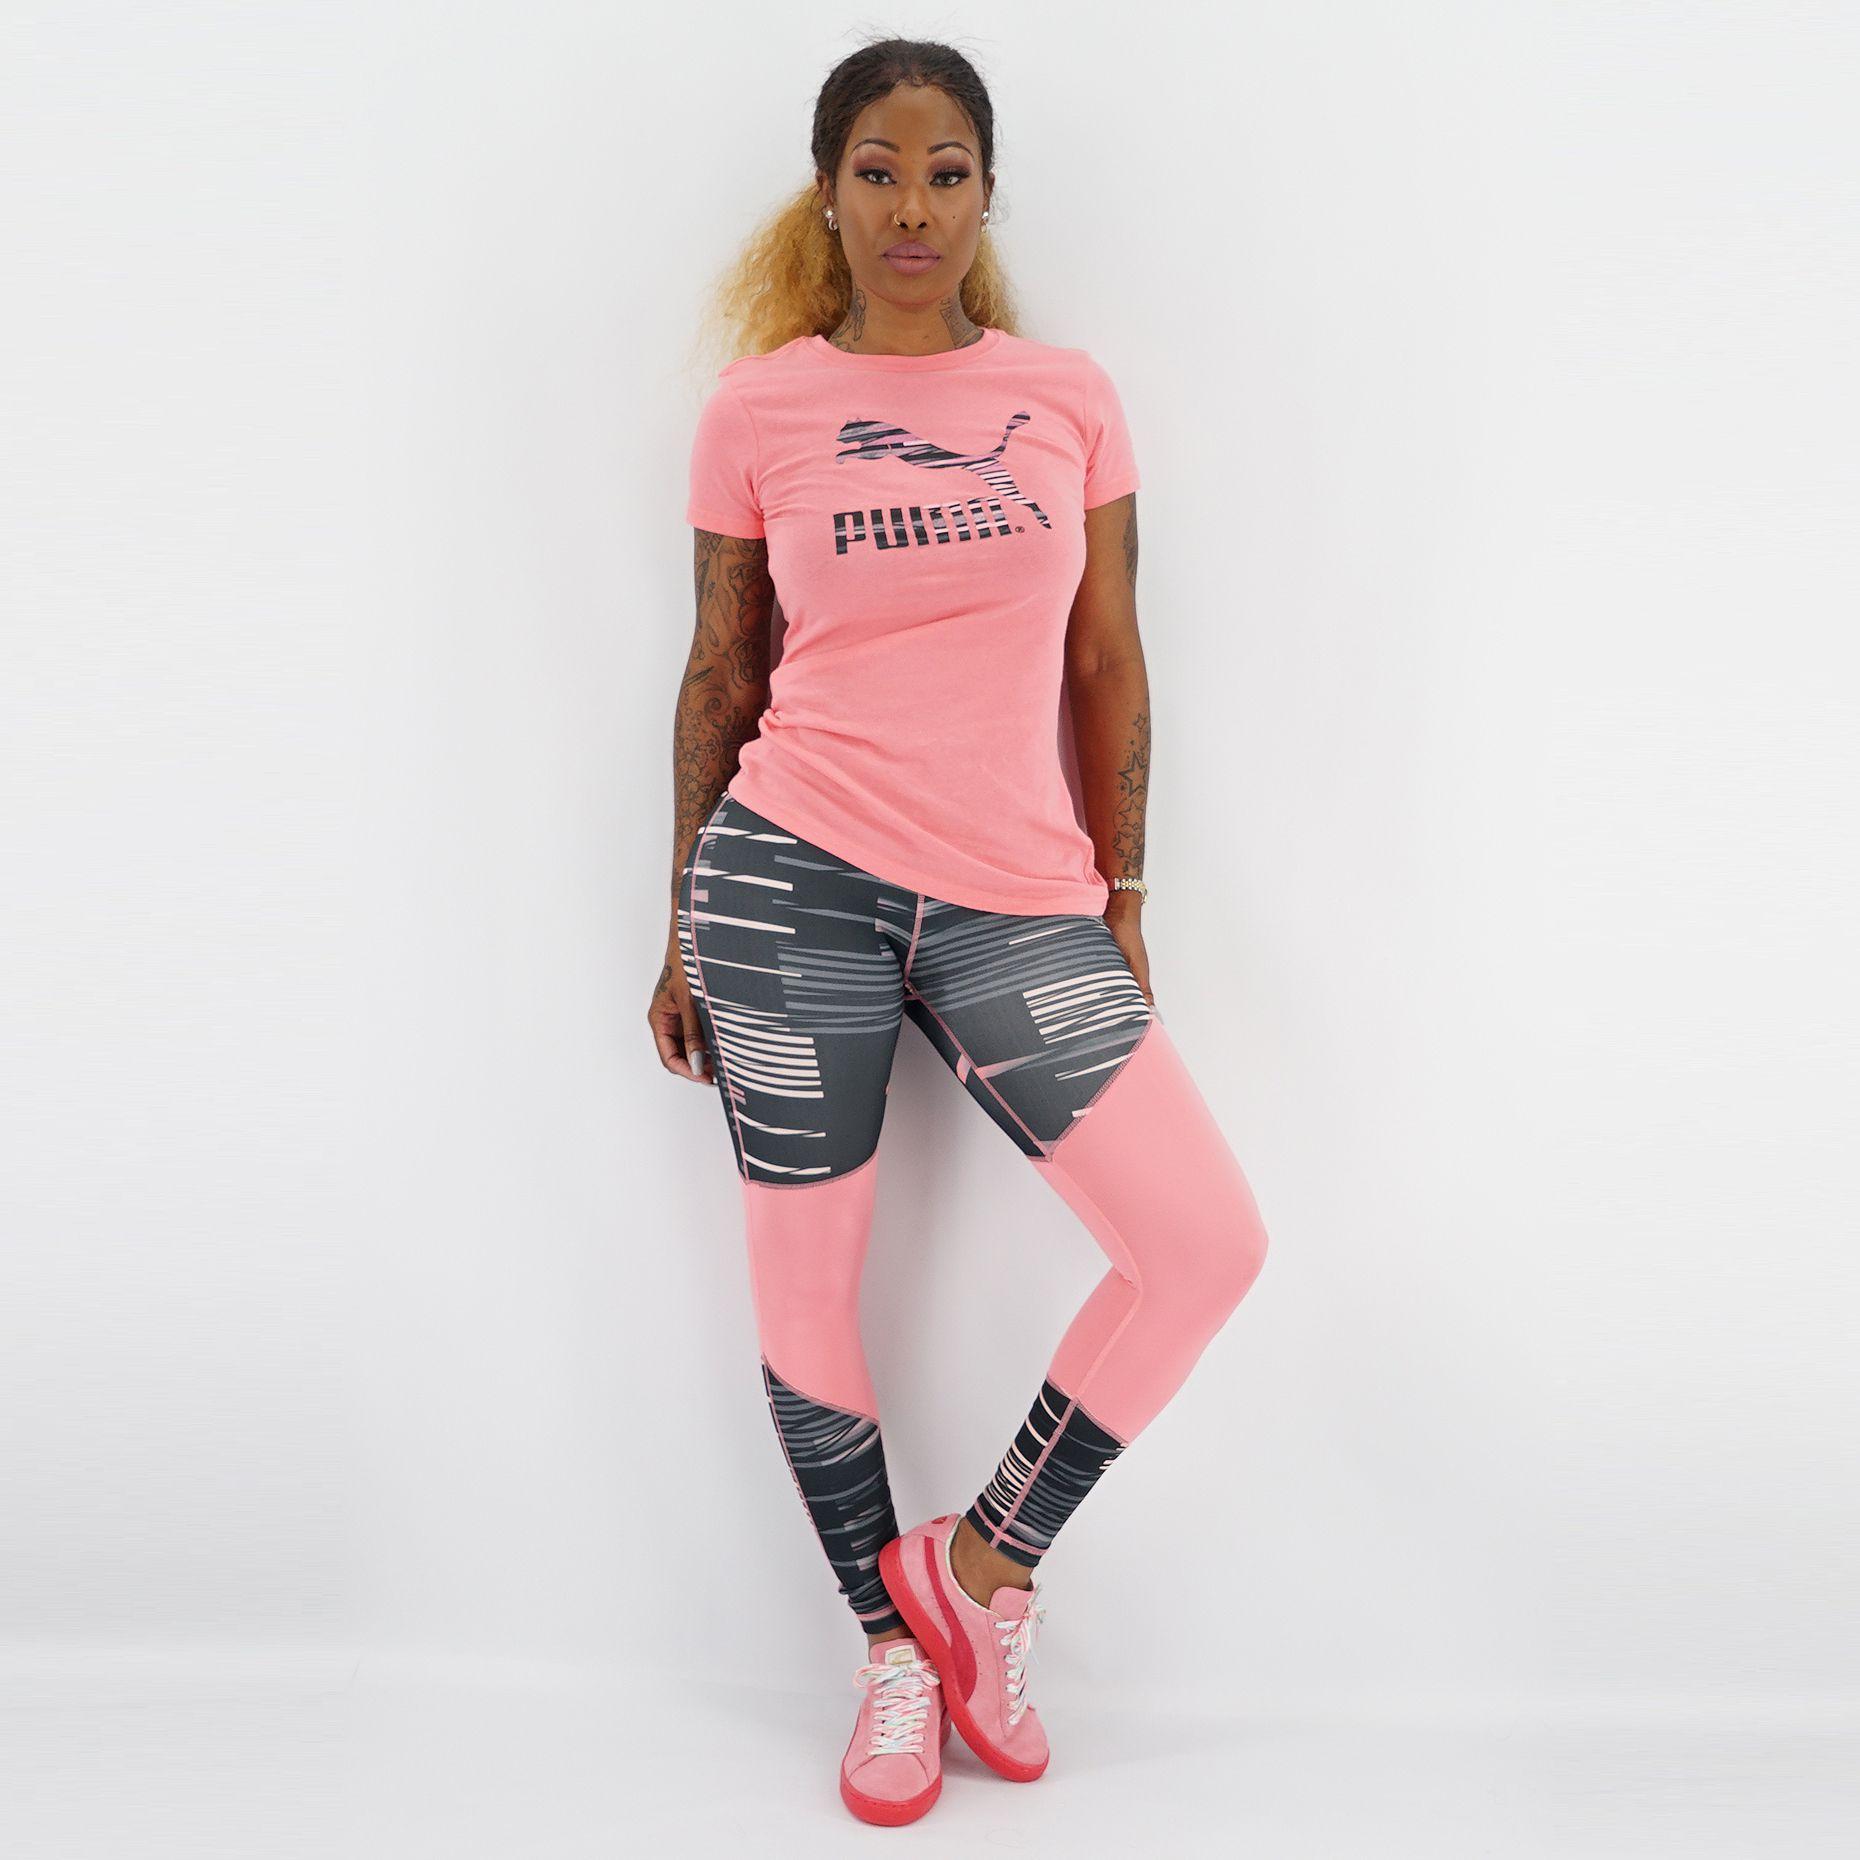 Women's  Puma x Clash Long Tight Pant x Suede Classic Lo Coast x LRG Logo Tee   Shop at YCMC.com #PUMA #Athletic #CasualWear #GraphicTankTop #ClashLongTightLeggings #SneakerChicks #Summer2015 #Streetwear #MissYCMC #AprilDivahStyle